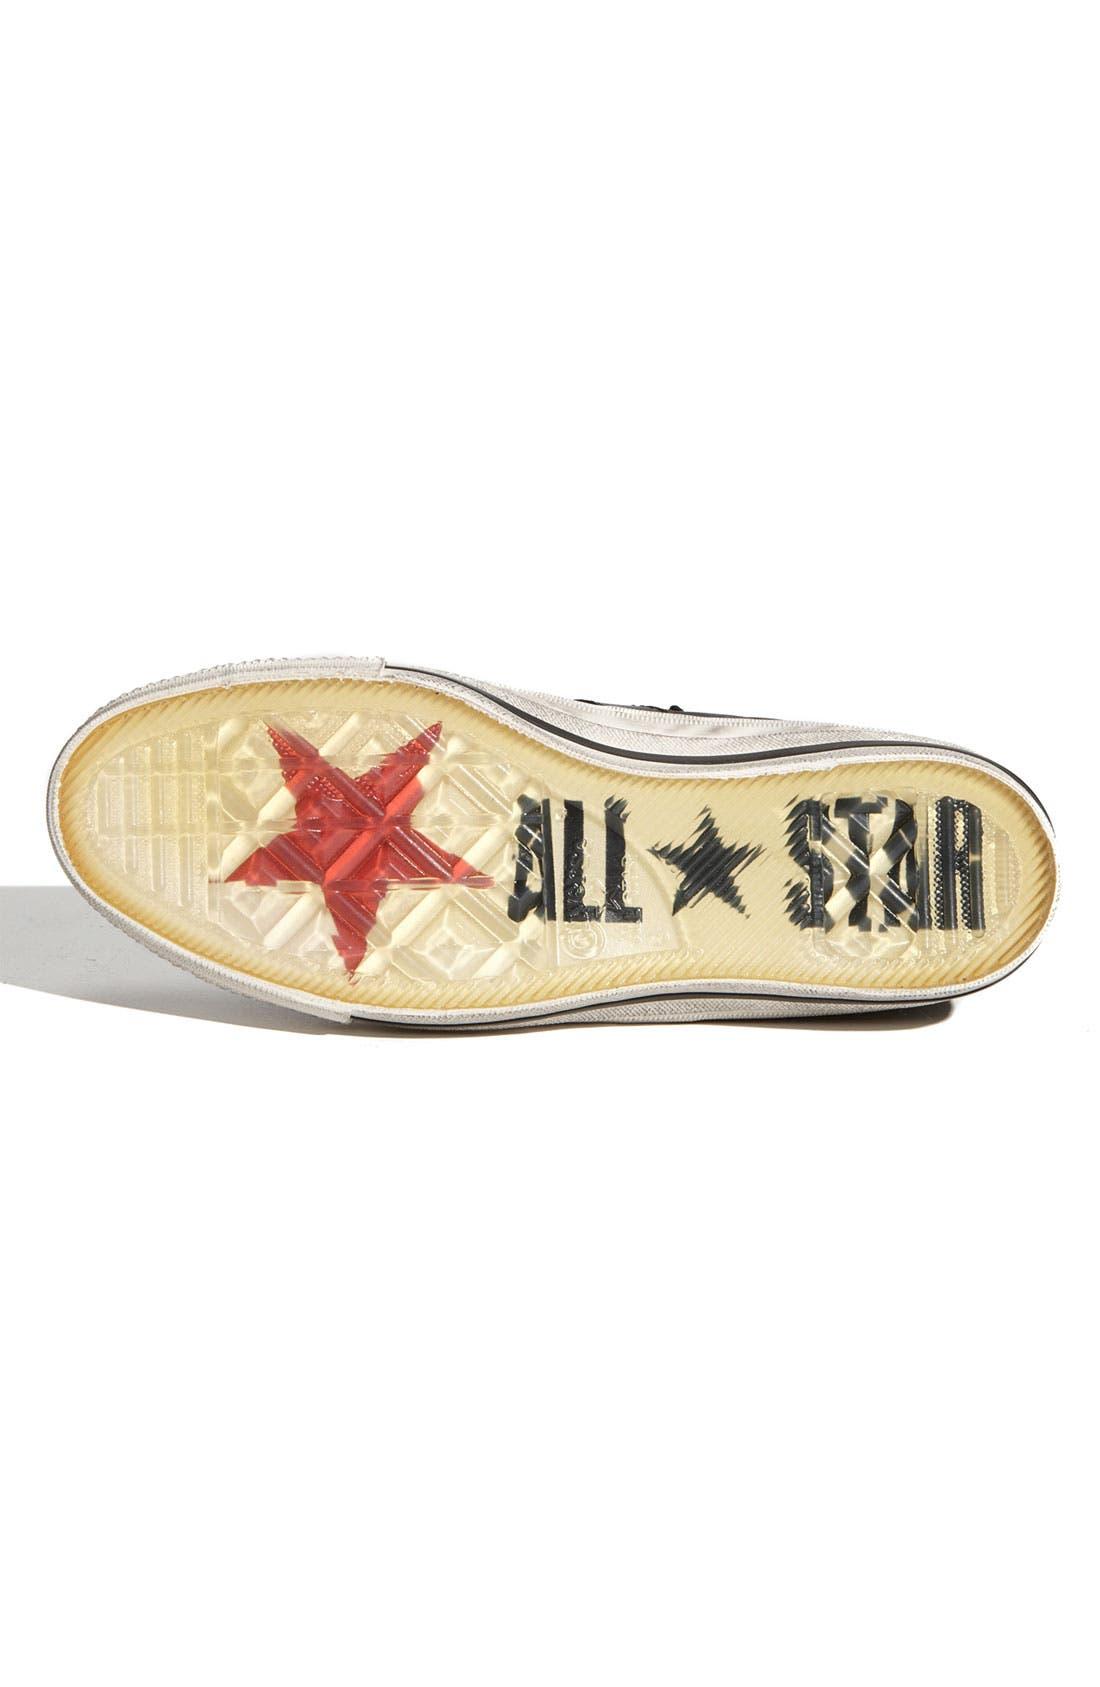 'Star Player Mid' Sneaker,                             Alternate thumbnail 4, color,                             001